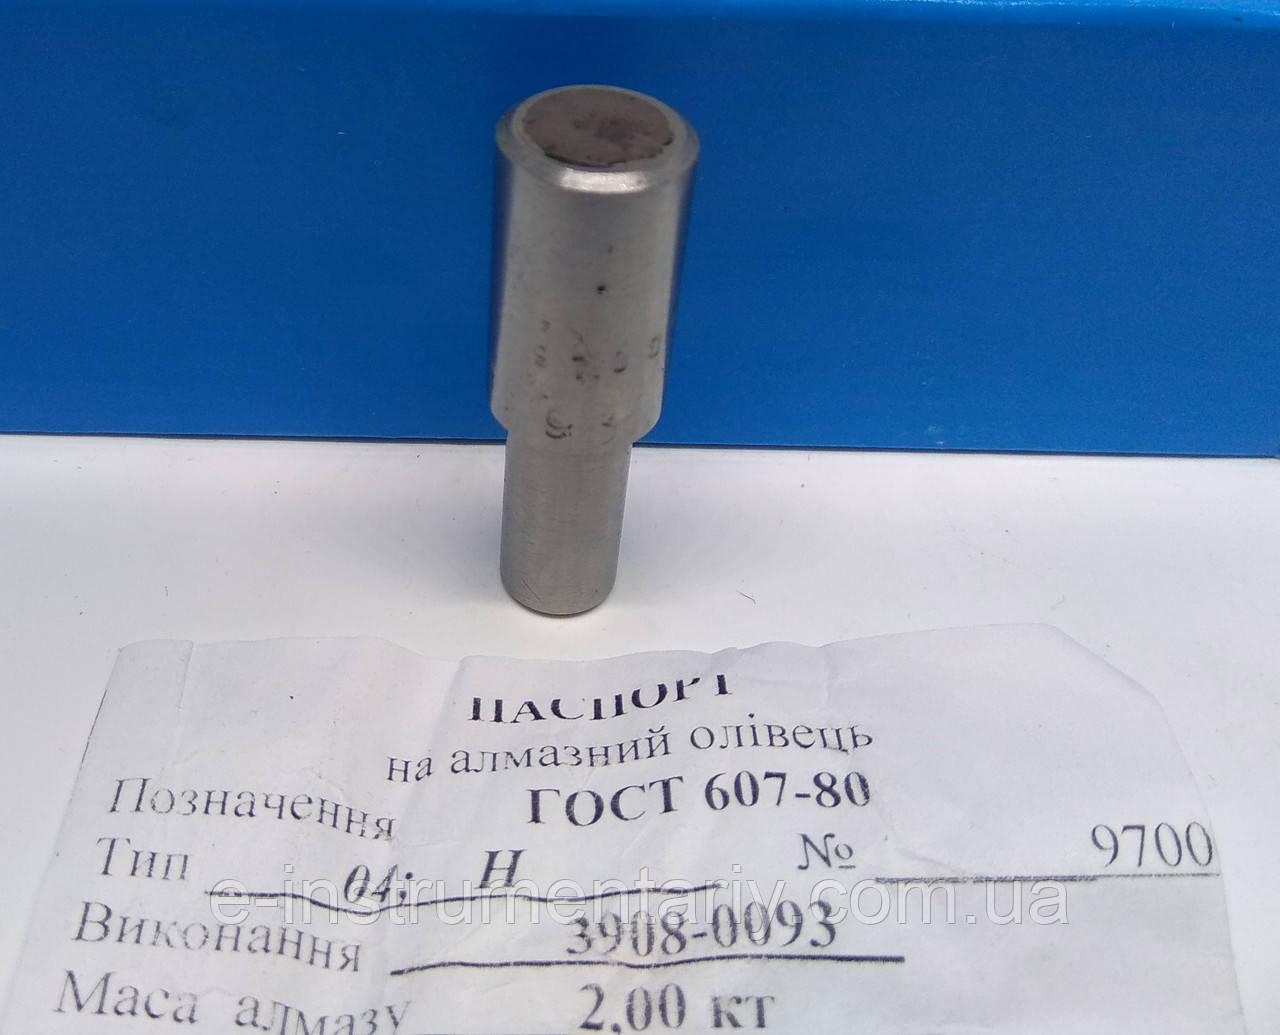 Карандаш алмазный 3908-0093 тип 04 исп.С 2,0 карат. качество- 1